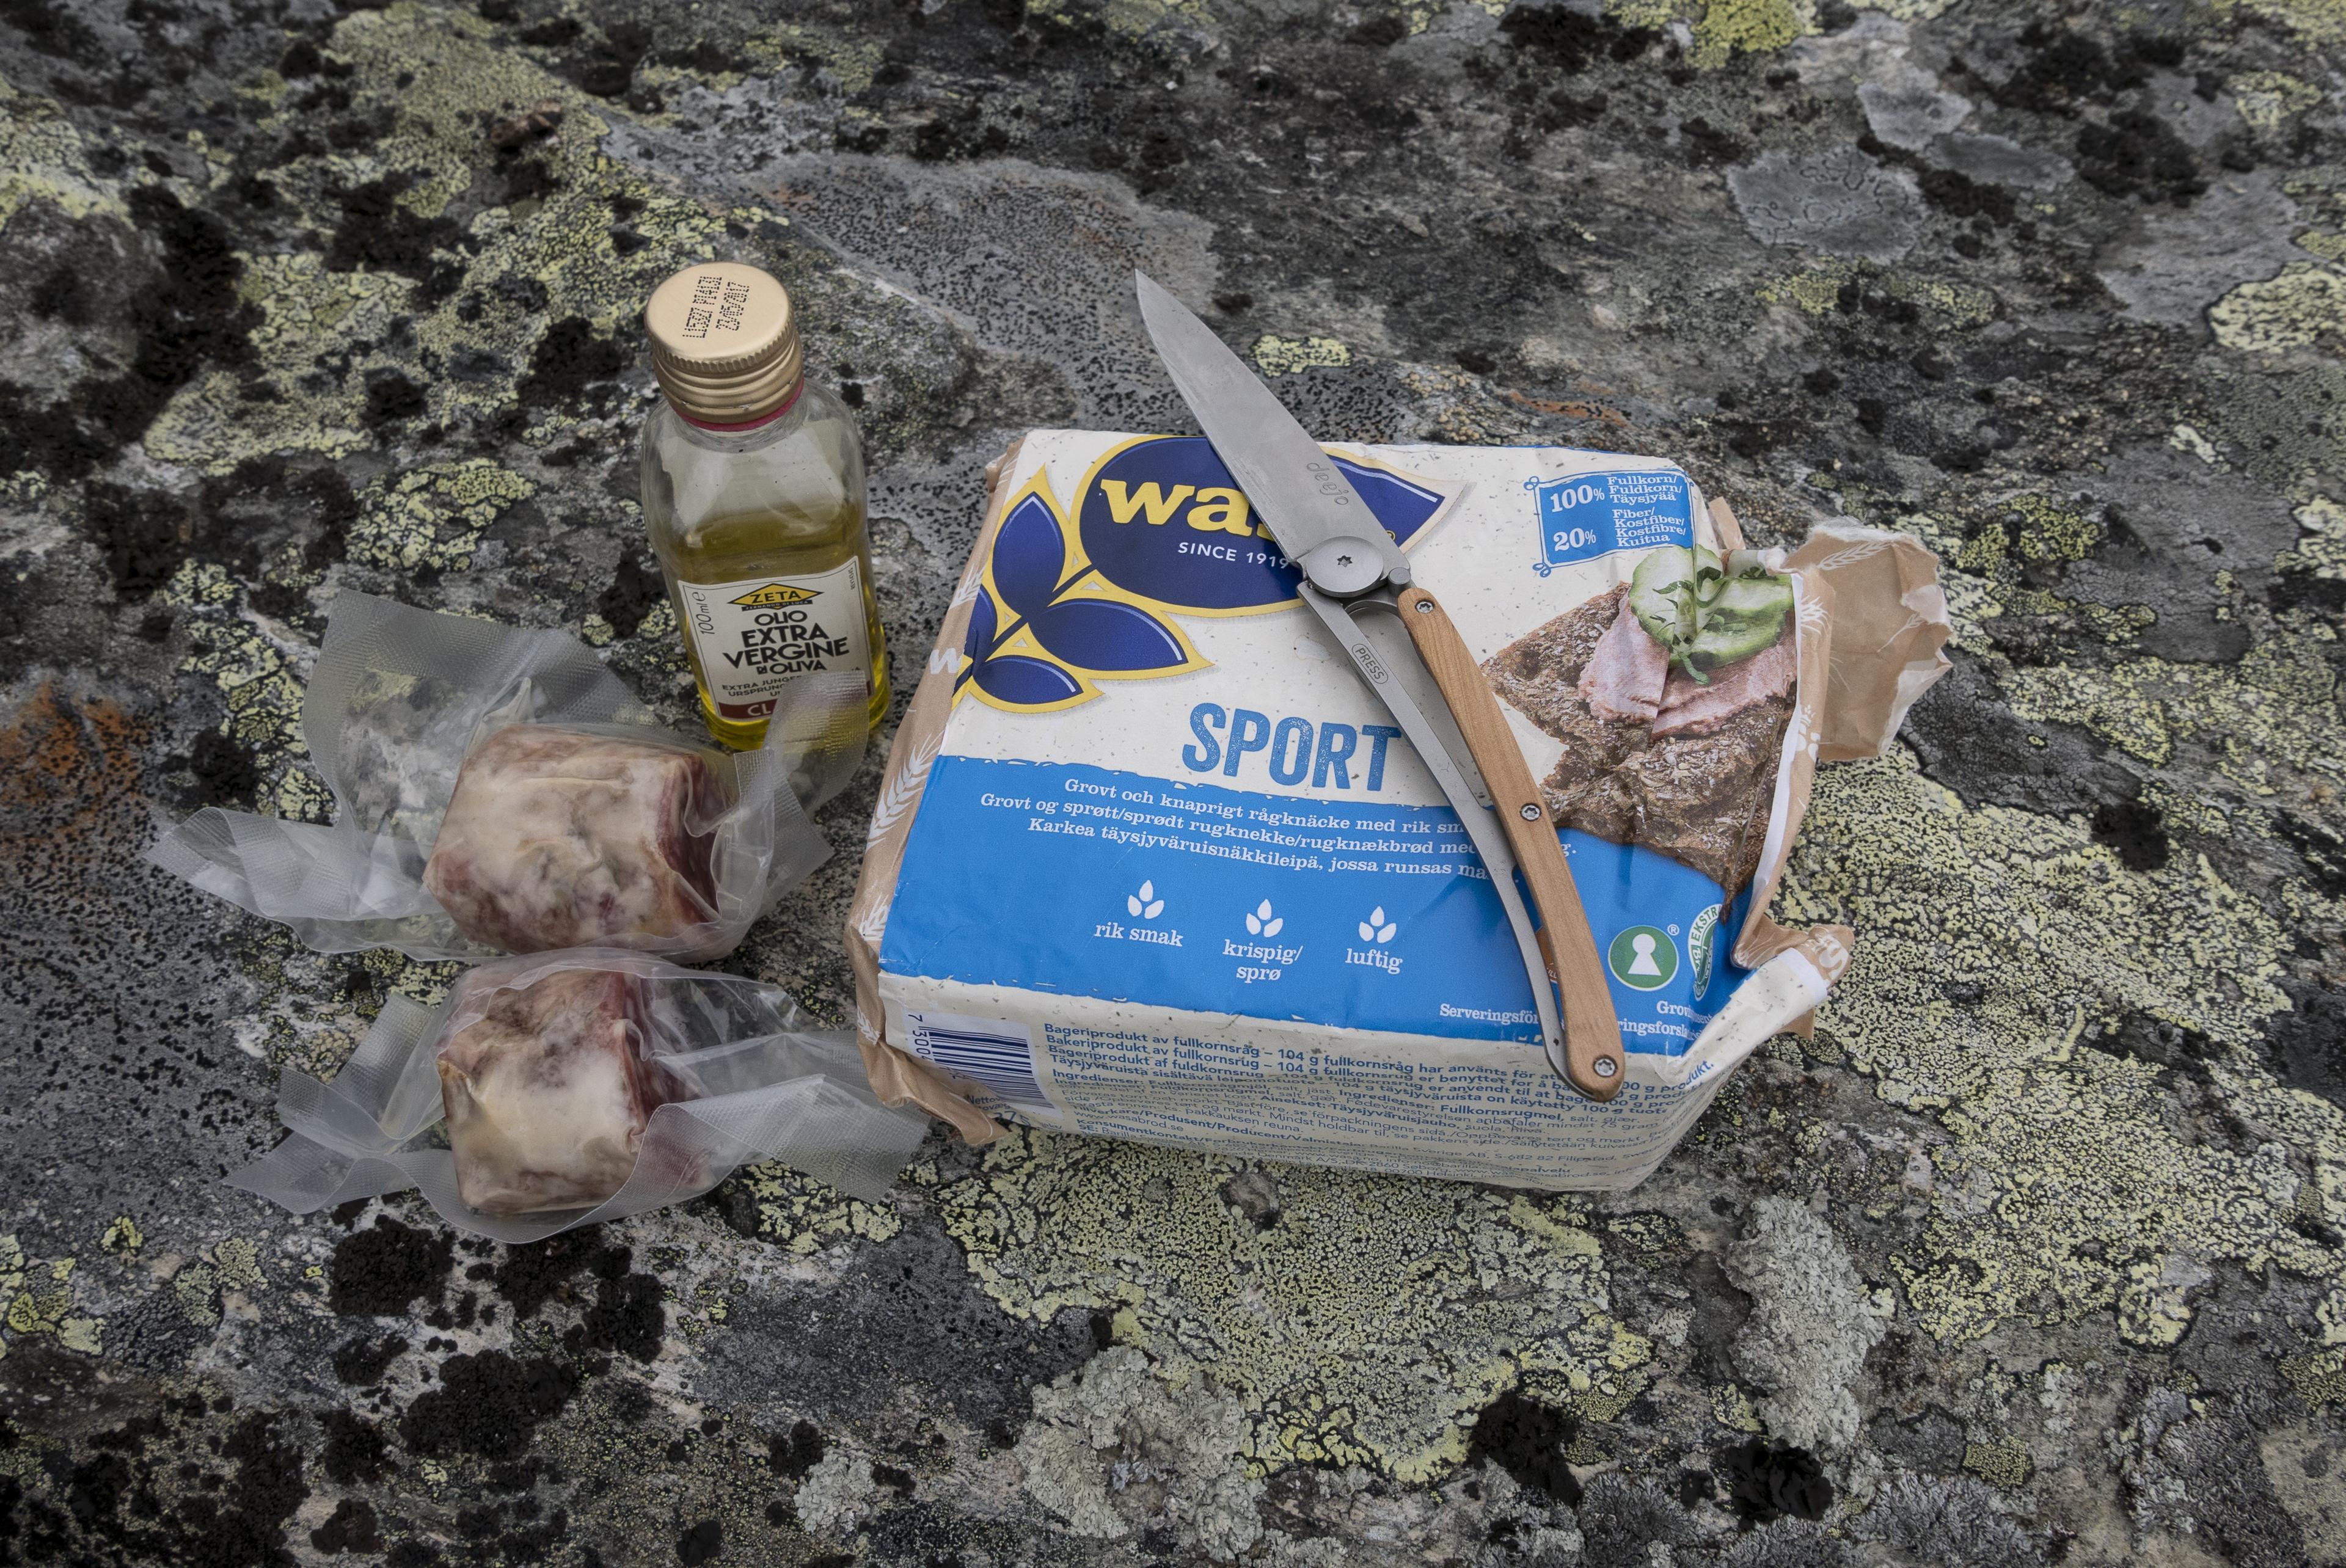 Frühstück aus Knäckebrot, Salamella und Olivenöl,©Markus Proske—Panasonic DMC-LX100, 24mm, 1/500s, Blende 6.3, ISO 200